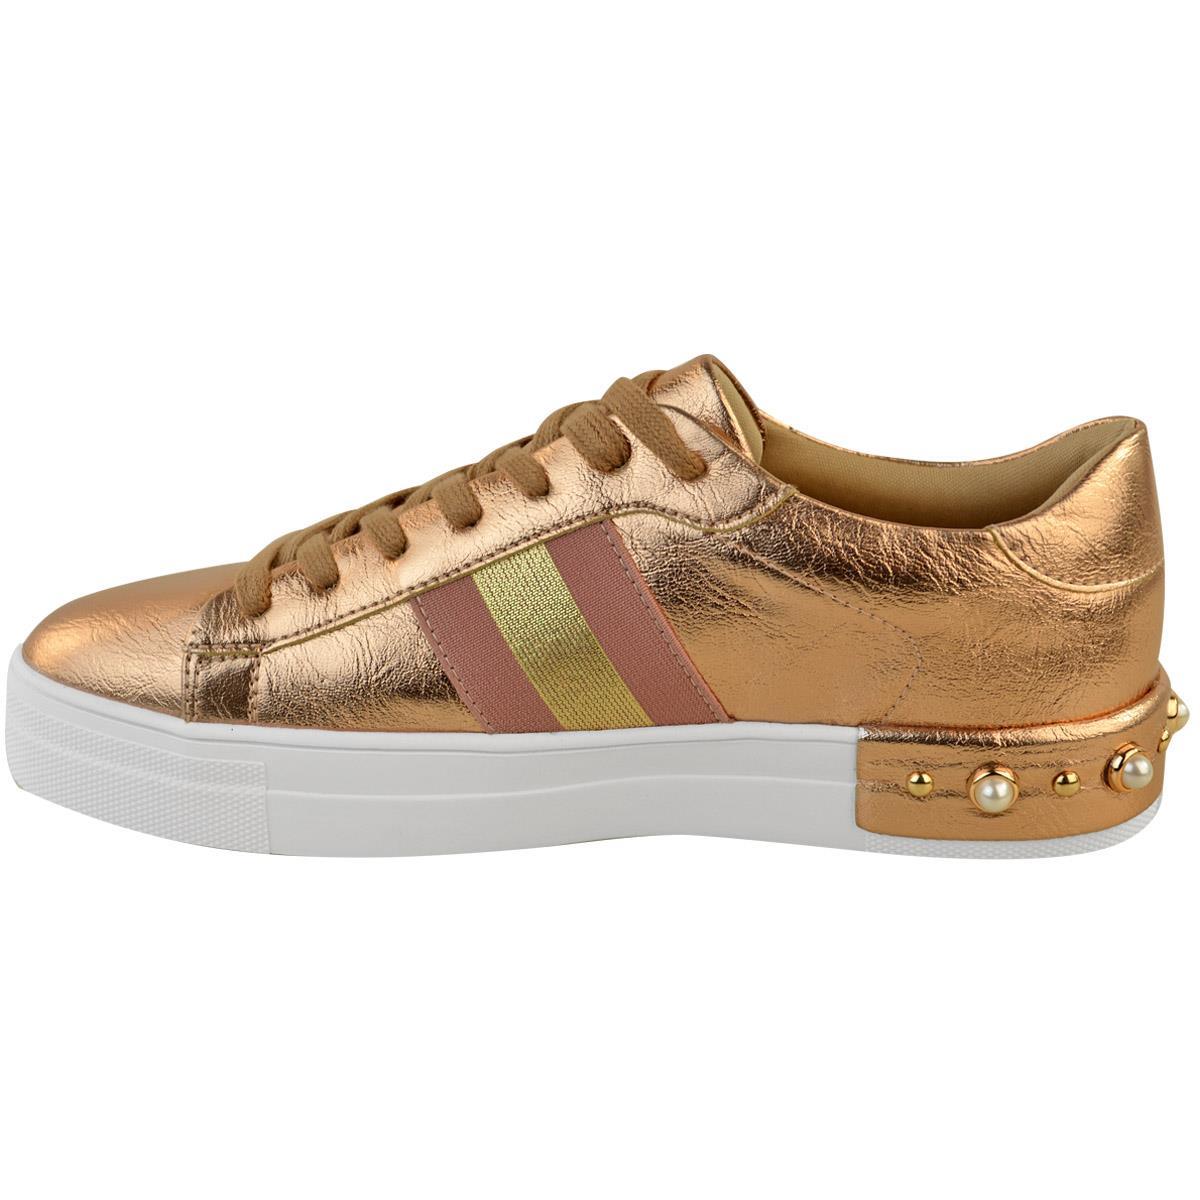 Womens Pearl Detail Stripe Trainers shoes Sizes UK 3,4,5,6,7,8 EU 36,37,38,39,41